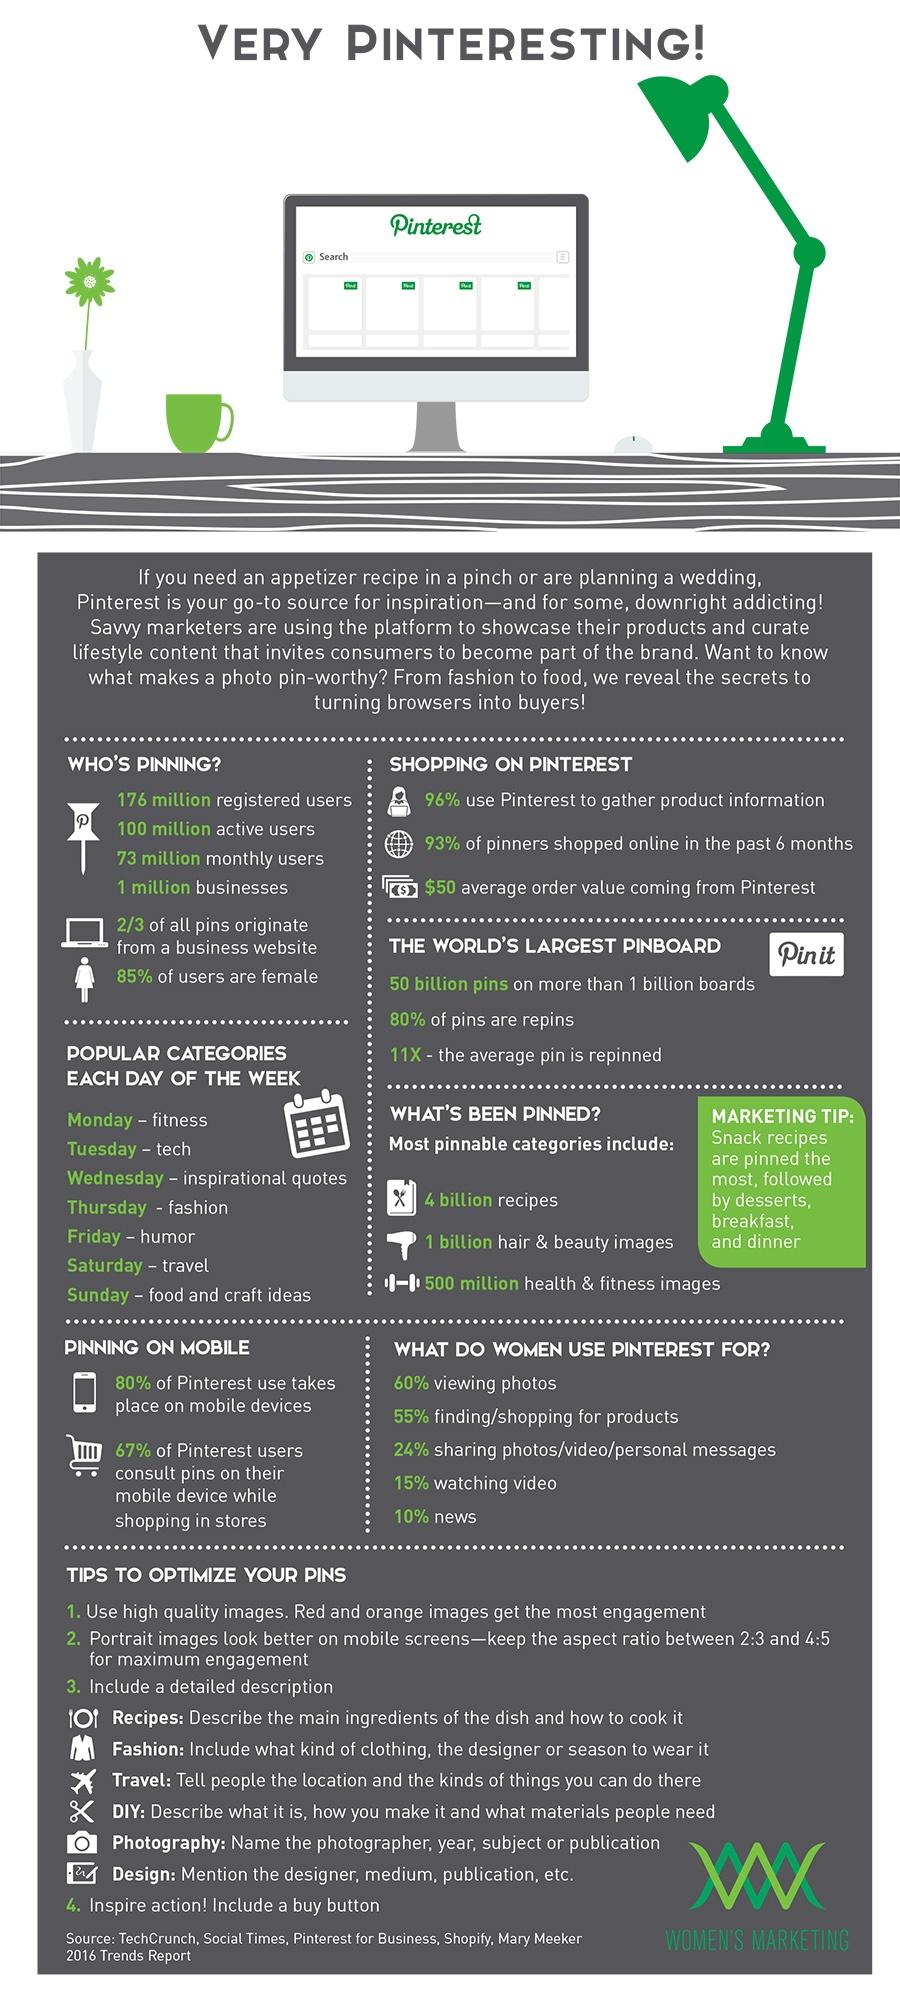 VeryPinteresting_Infographic.jpg